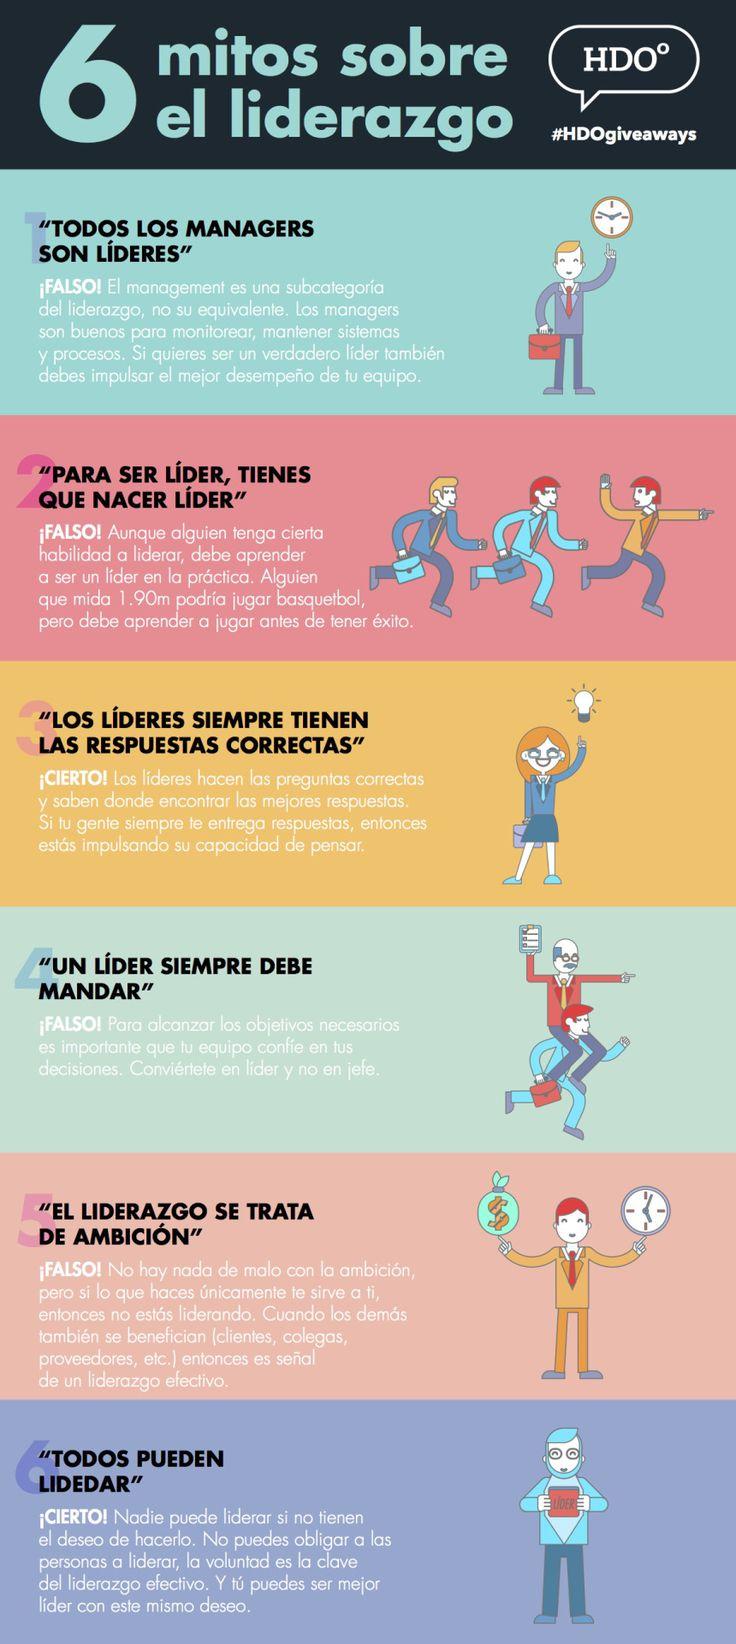 6 mitos sobre el Liderazgo #infografia #infographic #leadership